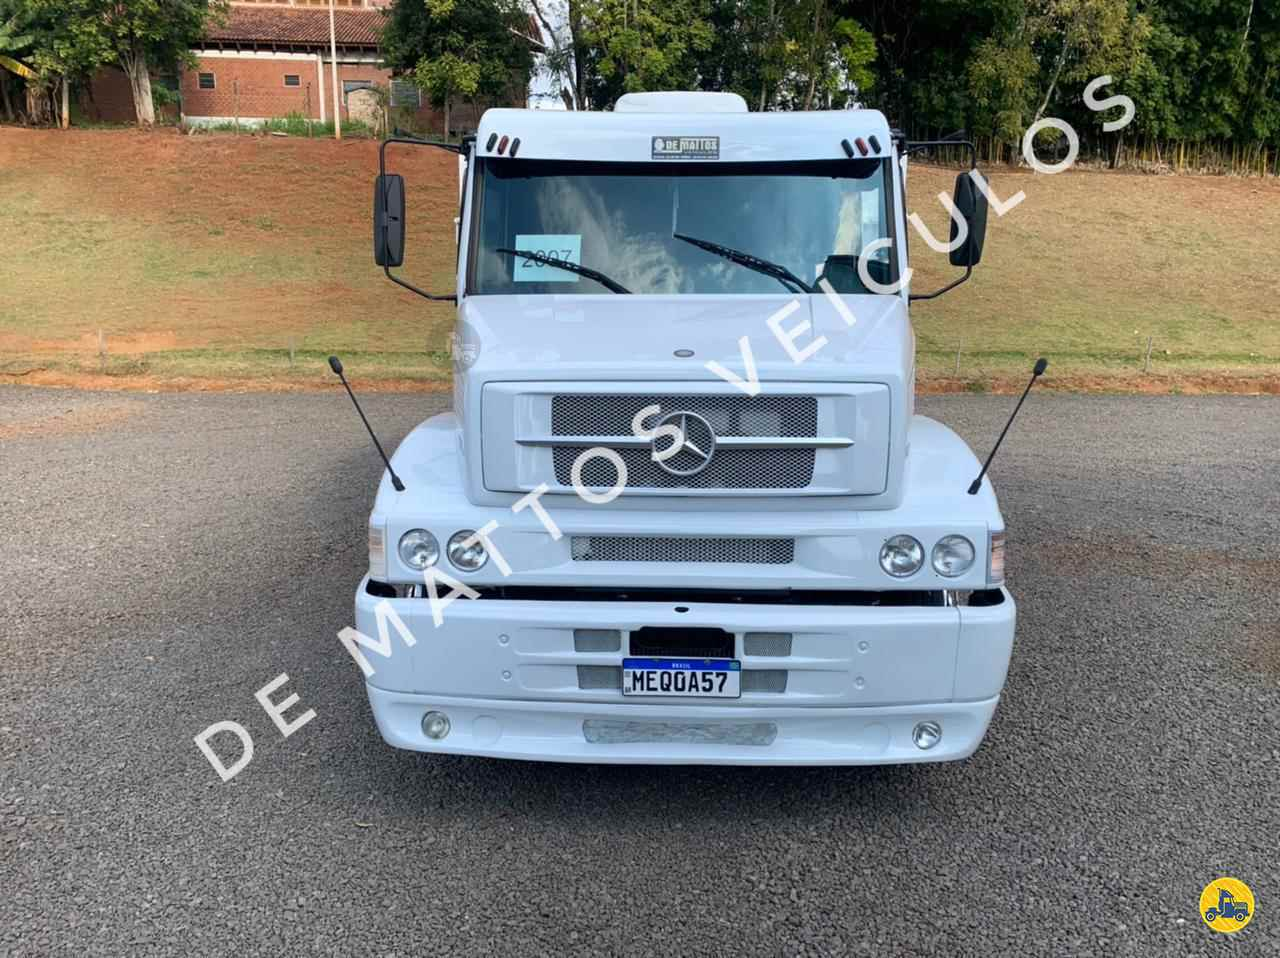 CAMINHAO MERCEDES-BENZ MB 1620 Graneleiro Truck 6x2 De Mattos Veículos TUCUNDUVA RIO GRANDE DO SUL RS